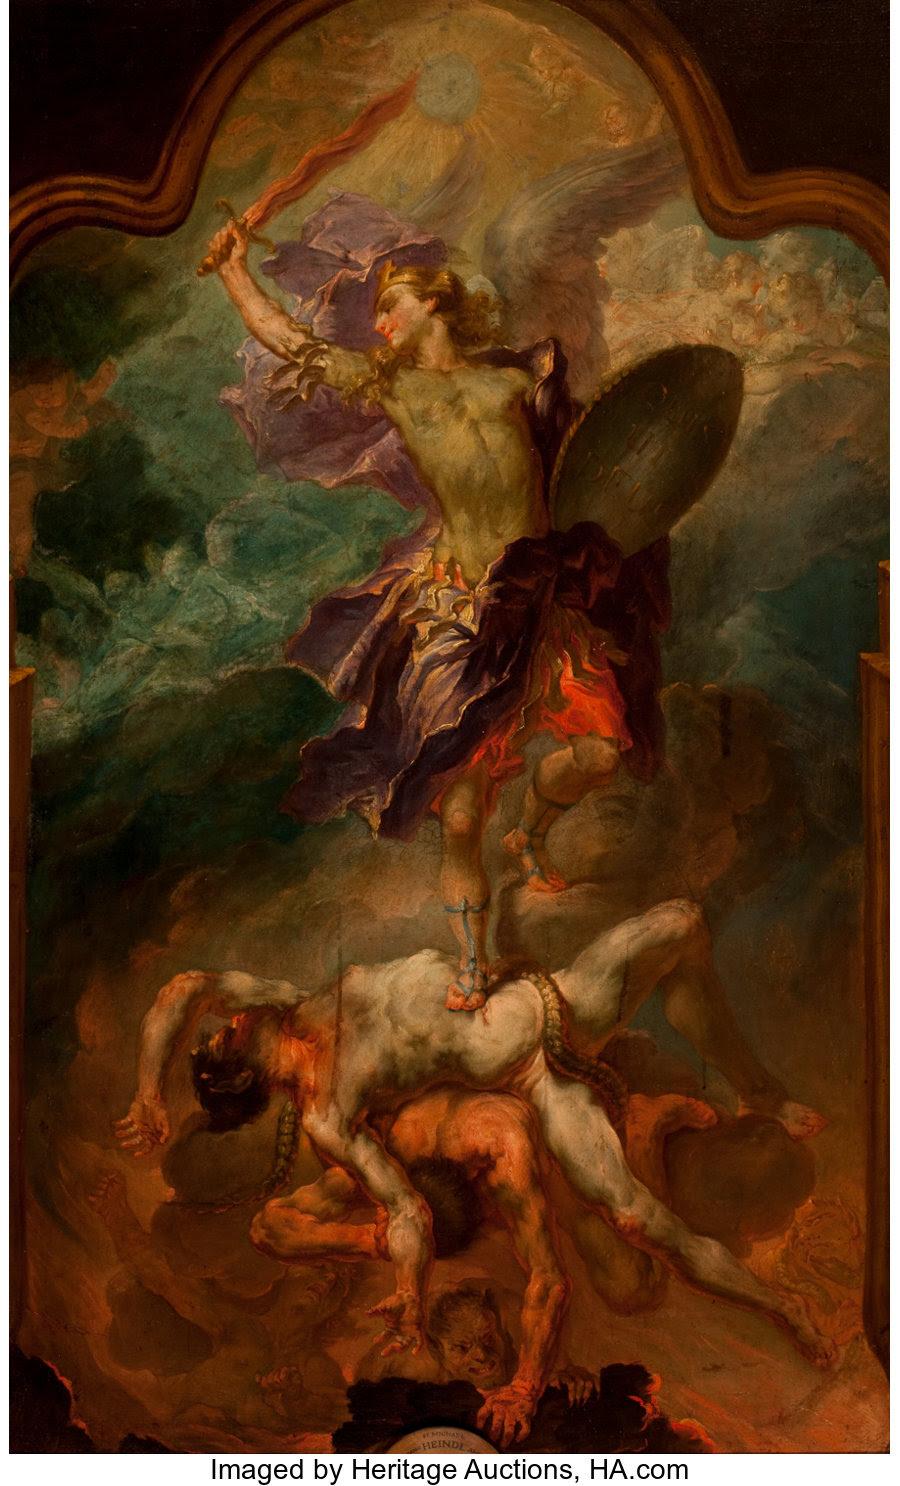 Fine Art - Painting, European, Circle of WOLFGANG ANDREAS HEINDL (Austrian, 1693-1757). SaintMichael. Oil on canvas. 51 x 32 inches (129.5 x 81.3 cm)... Image #1